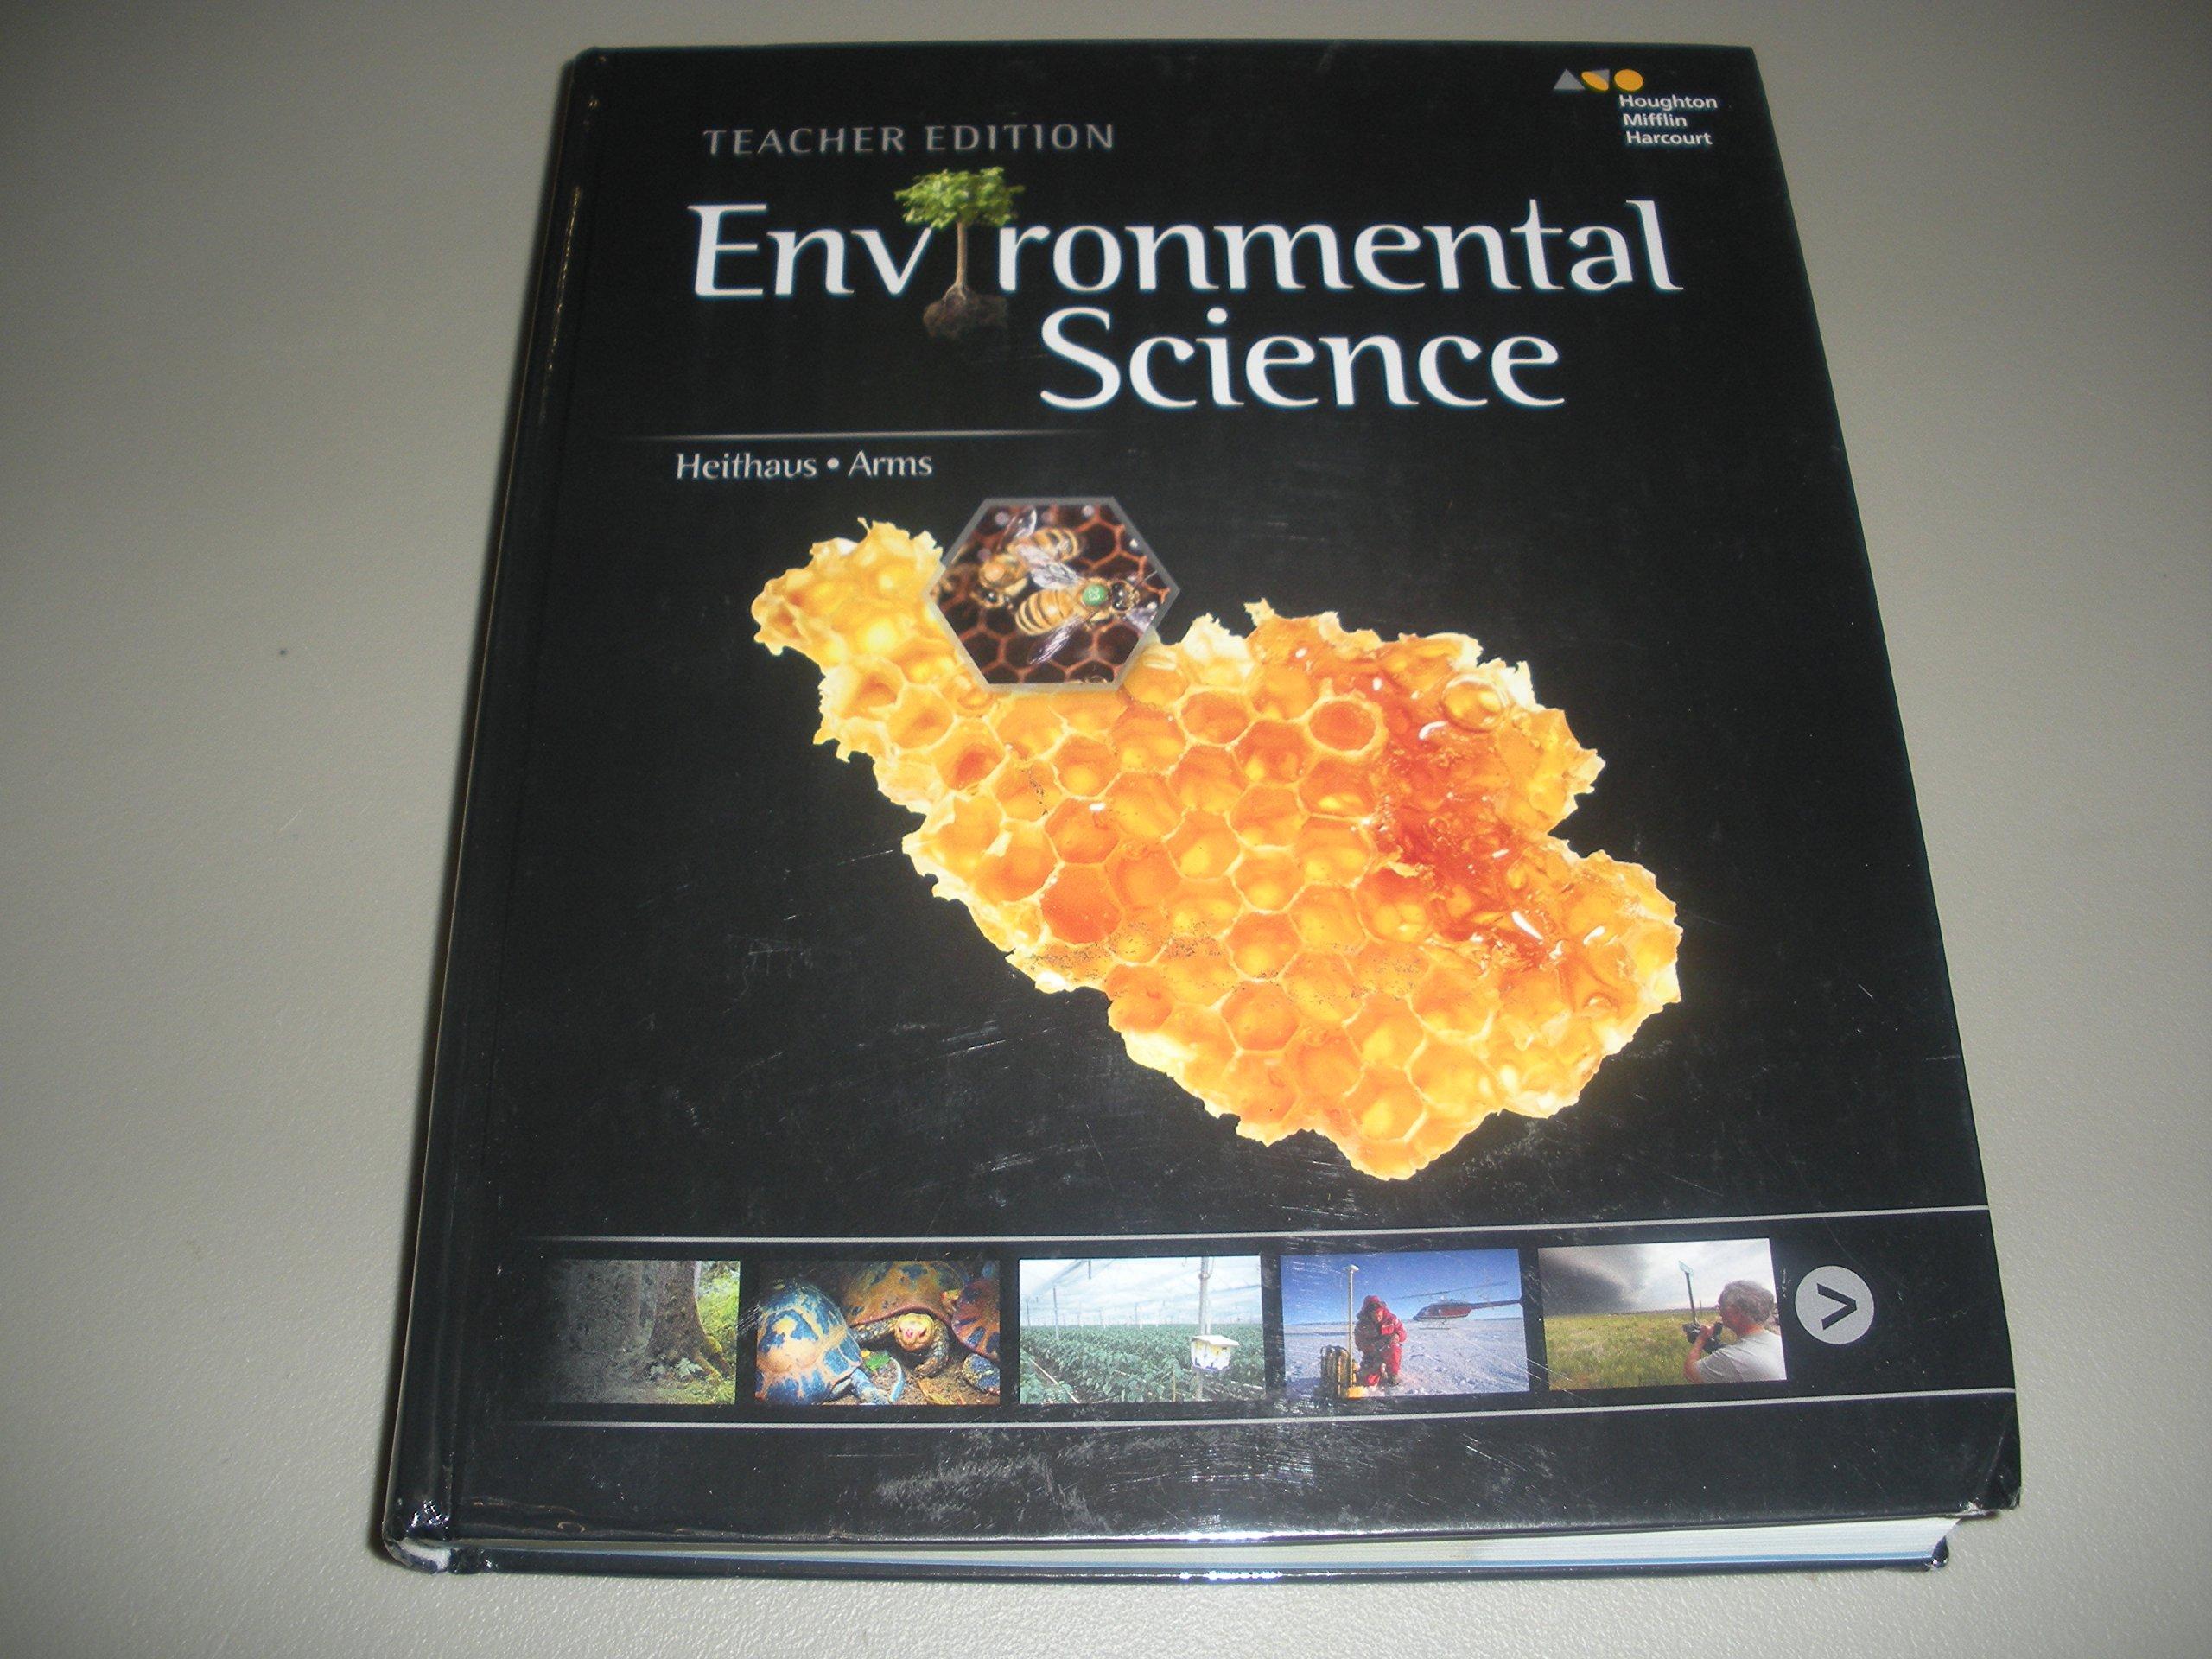 Holt McDougal Environmental Science: Teacher Edition 2013